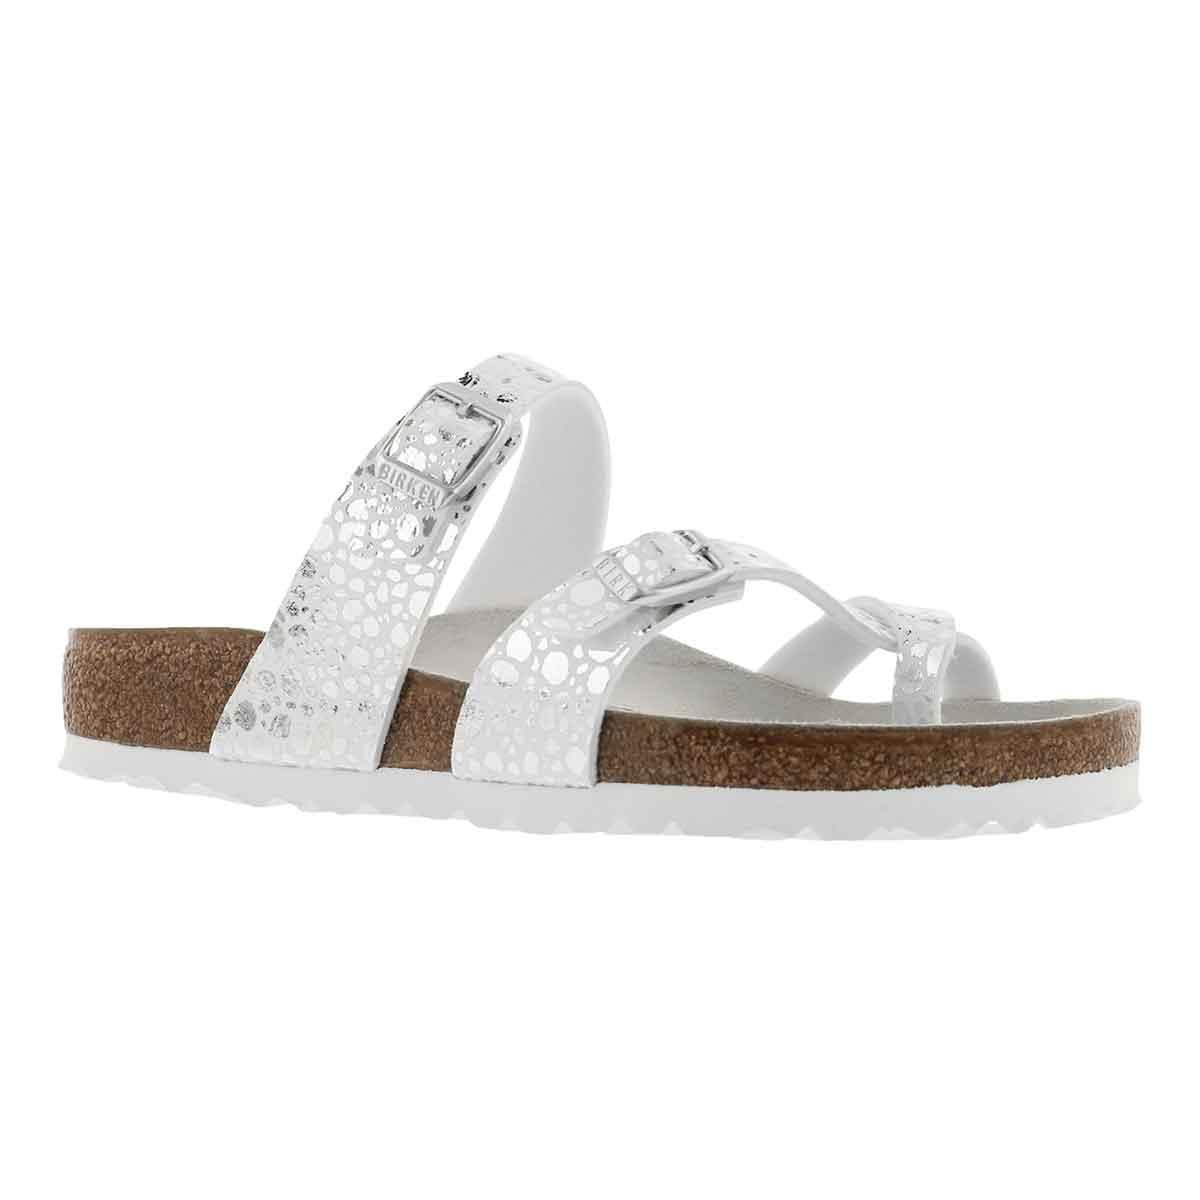 Women's MAYARI BF metalic stone silver sandal